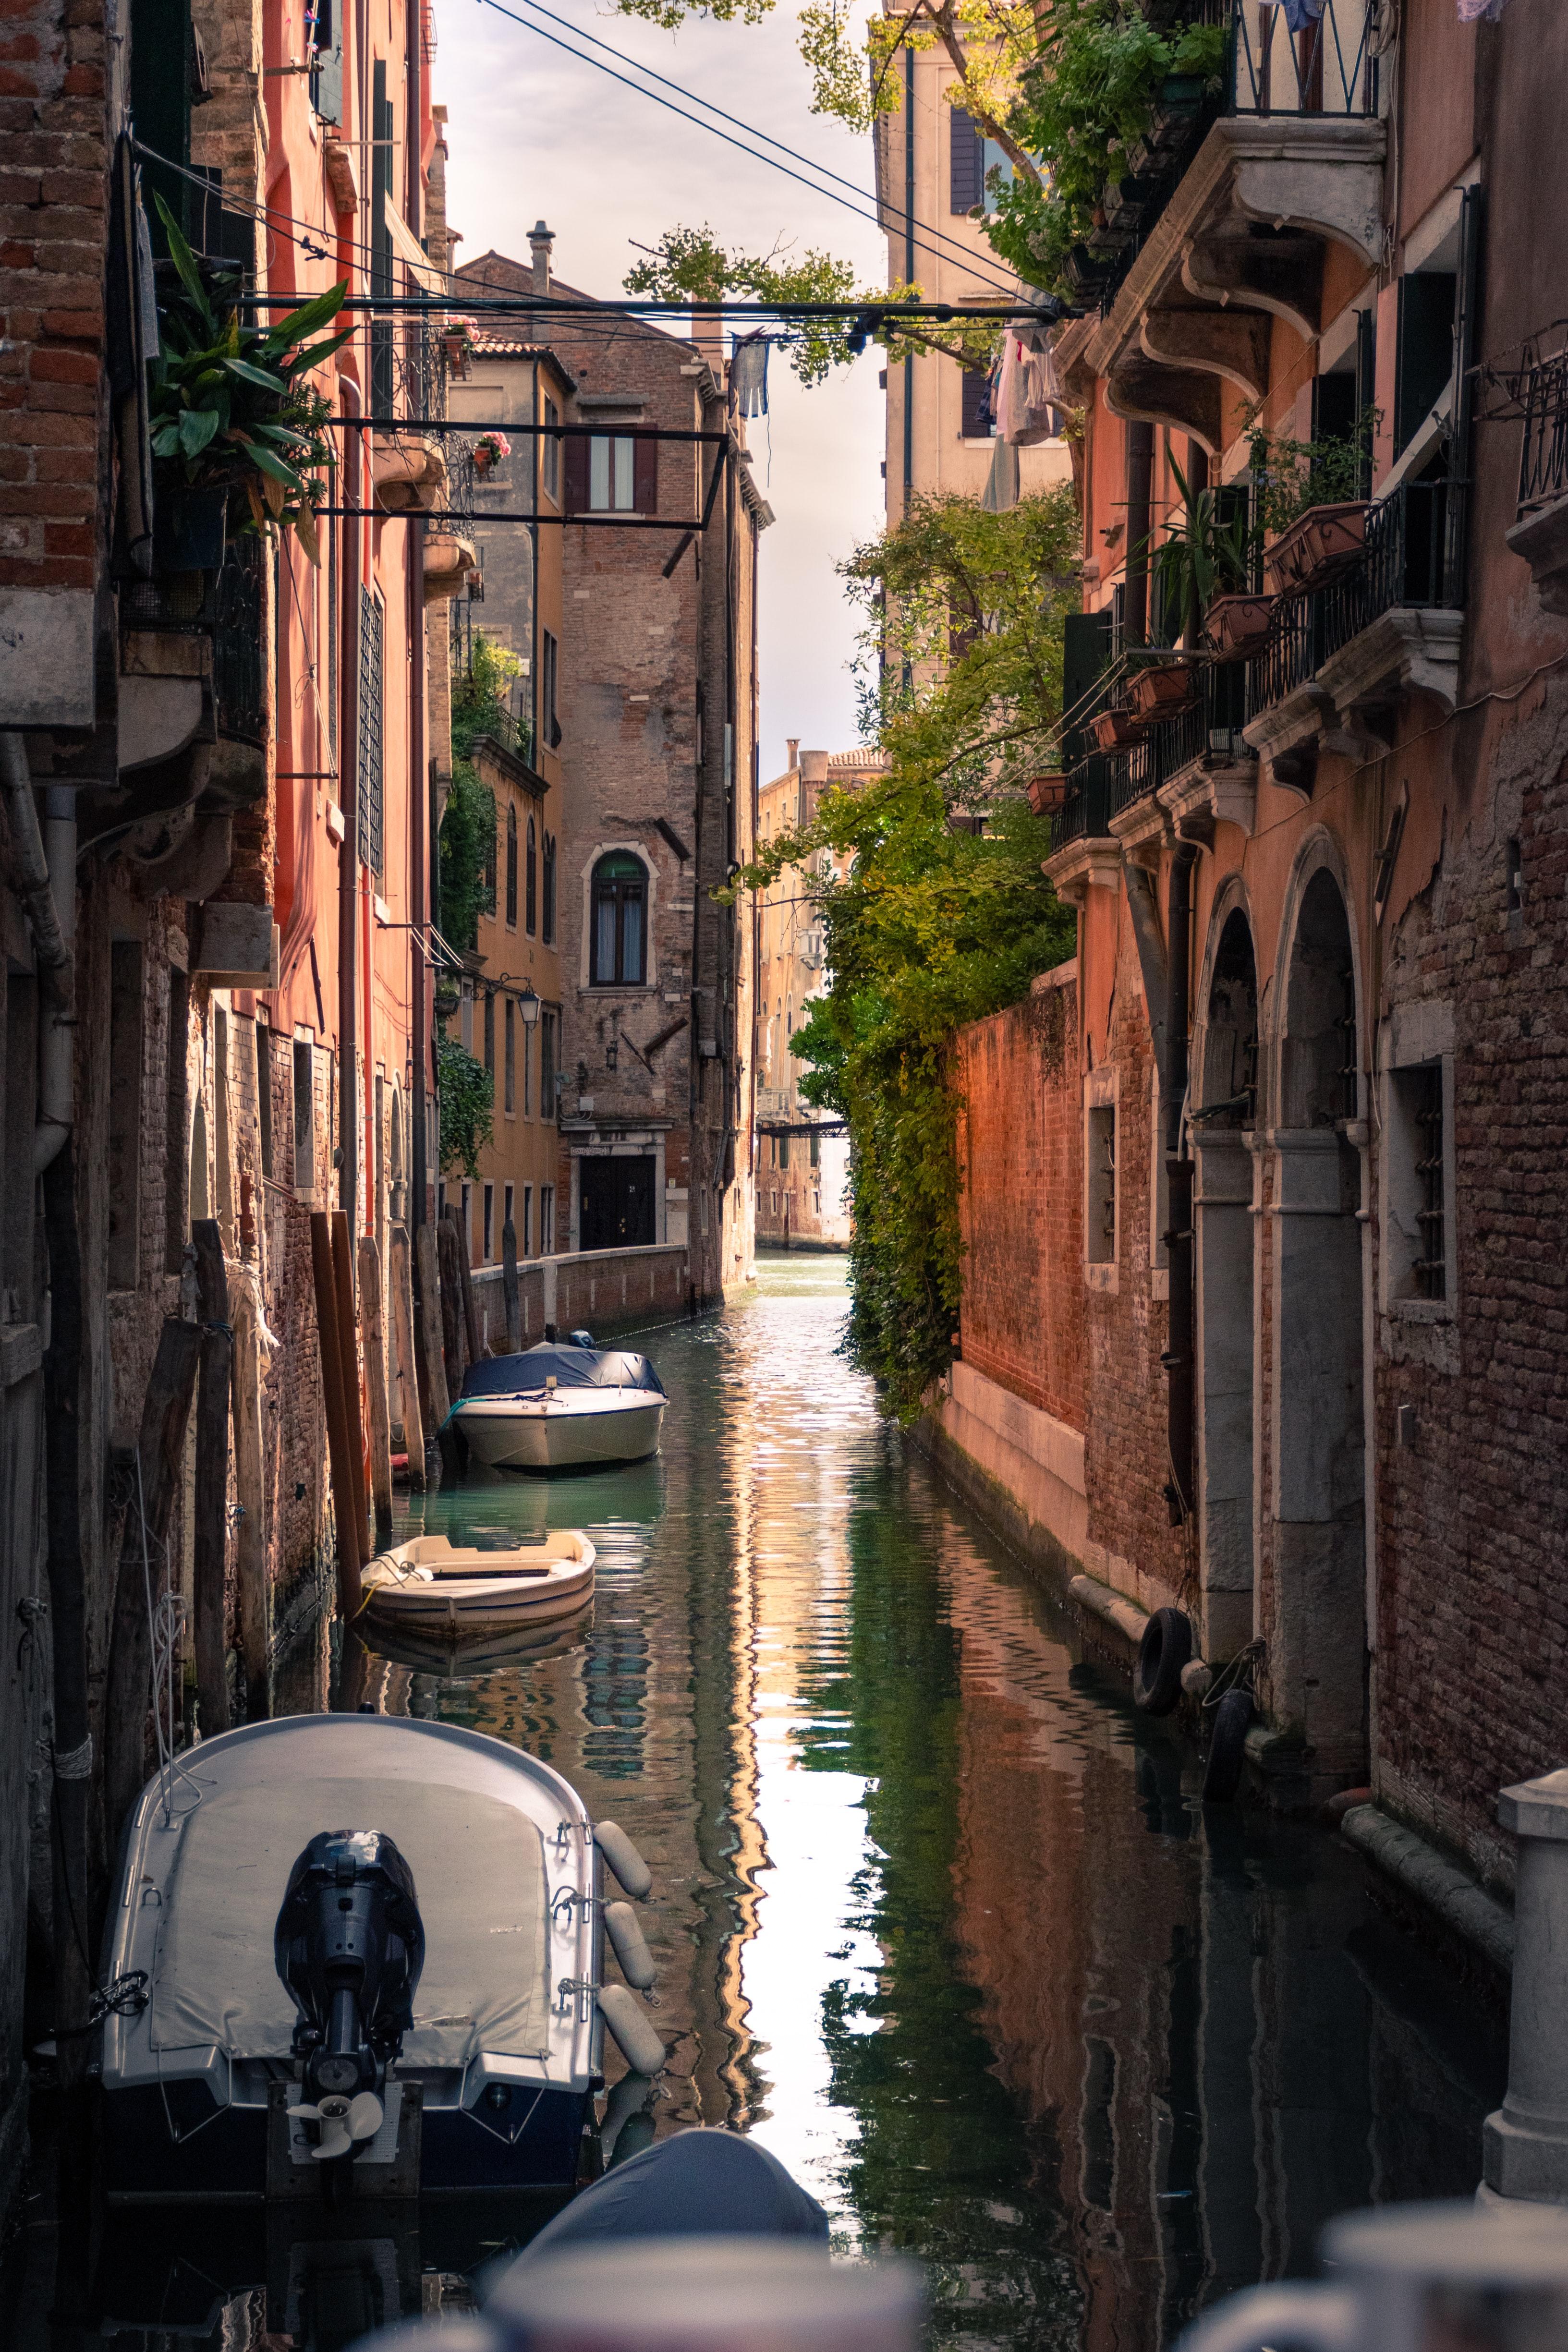 119762 скачать обои Архитектура, Фасад, Река, Города, Здания, Лодка - заставки и картинки бесплатно